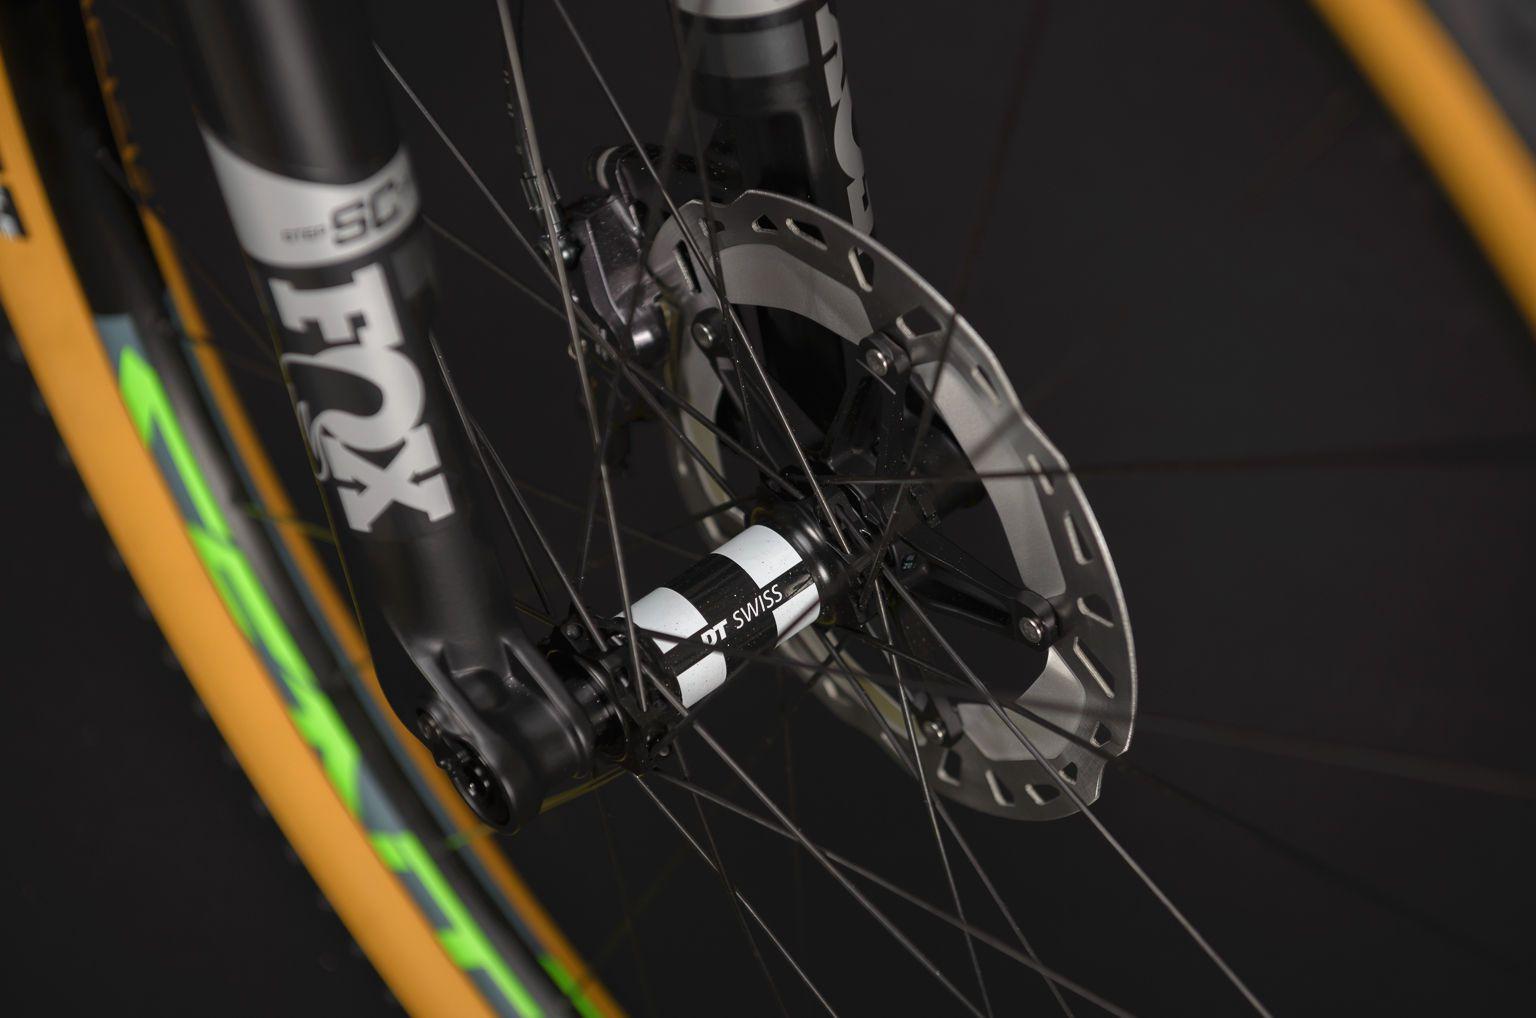 Bicicleta SENSE Impact Carbon Evo 2020 - Verde Neon/Chumbo